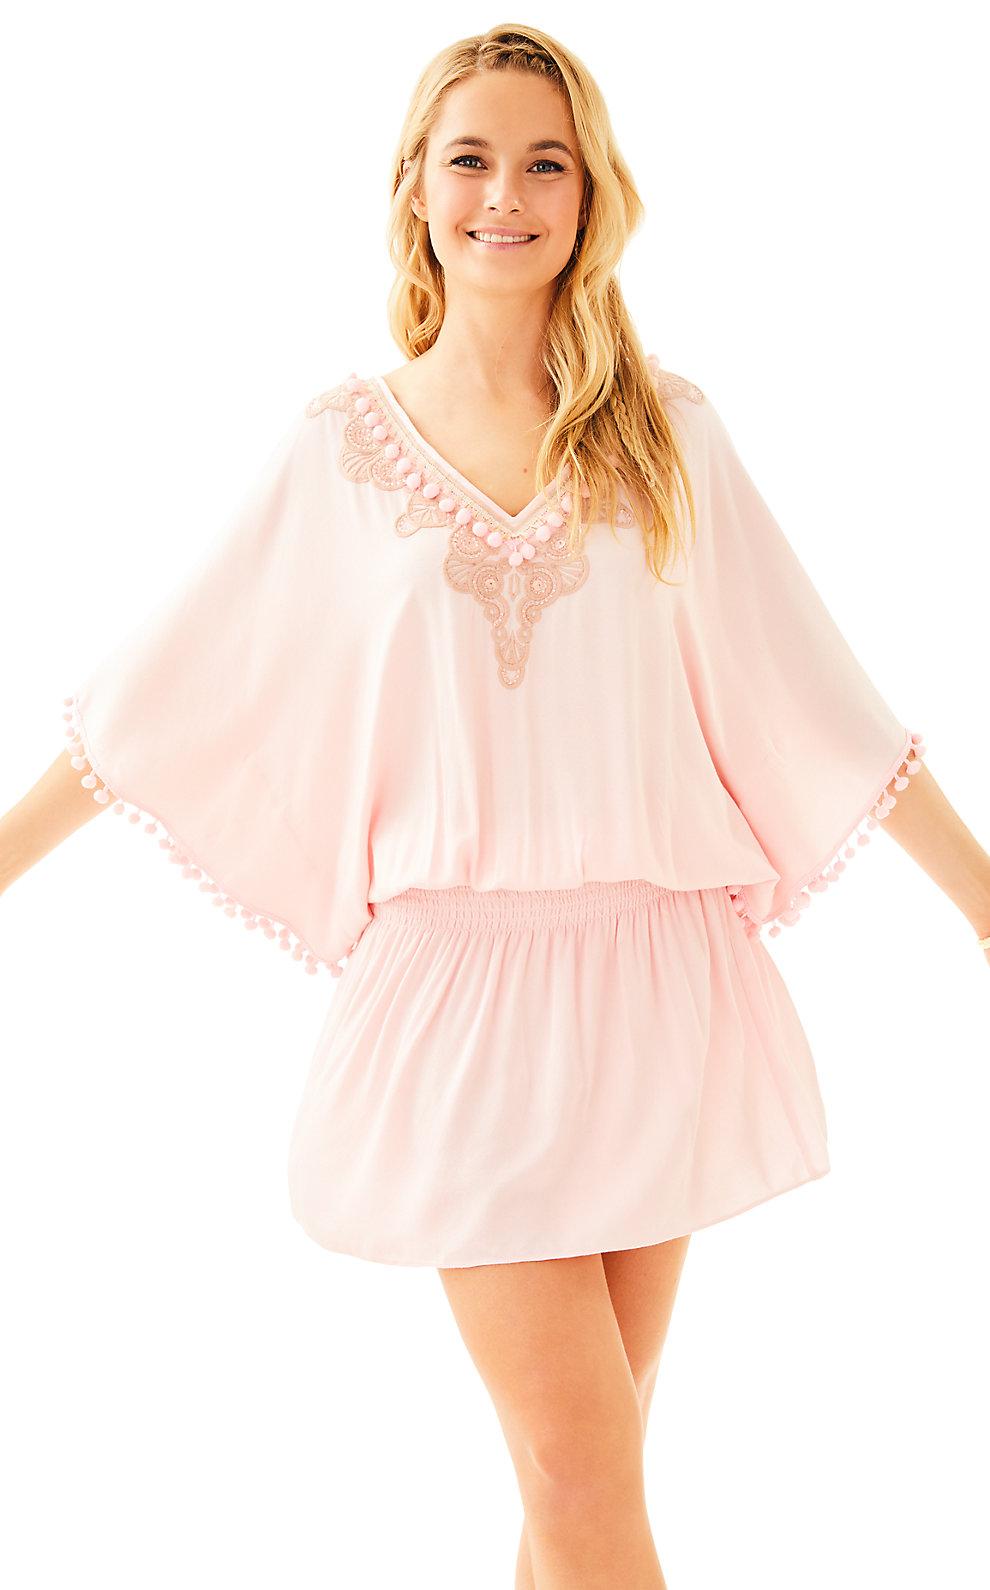 Lilly Pulitzer Vea Tunic Dress